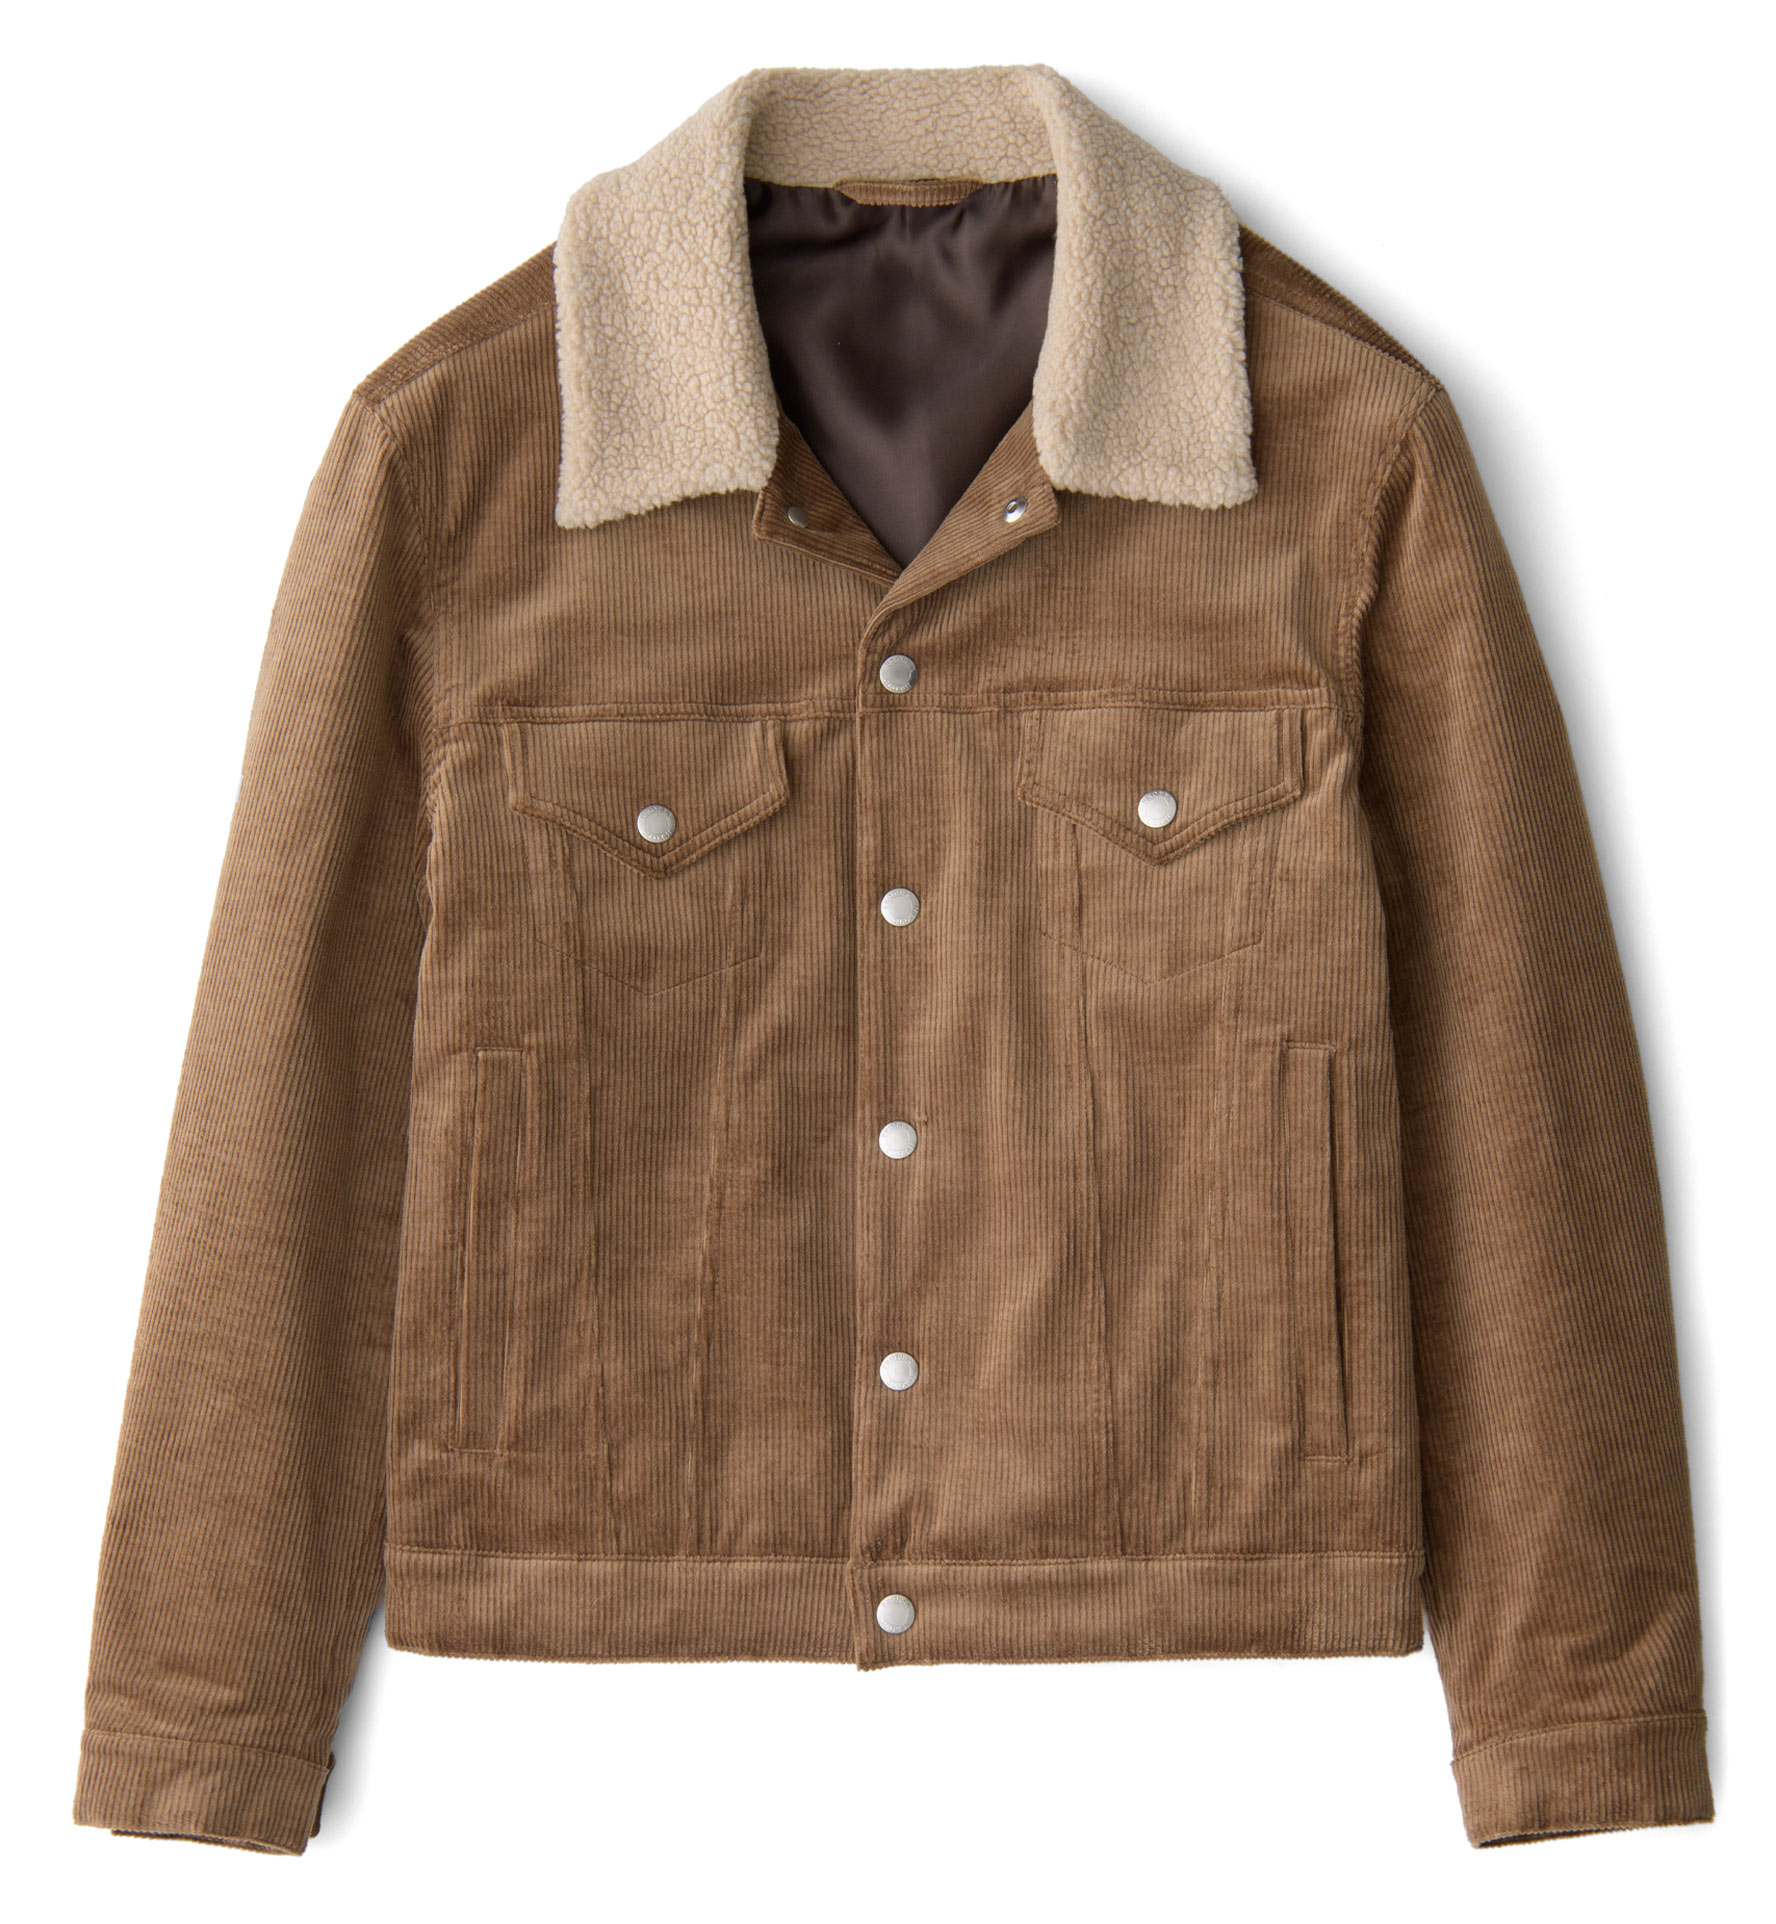 Zoom Image of Lafayette Chestnut Corduroy Shearling Collar Jacket